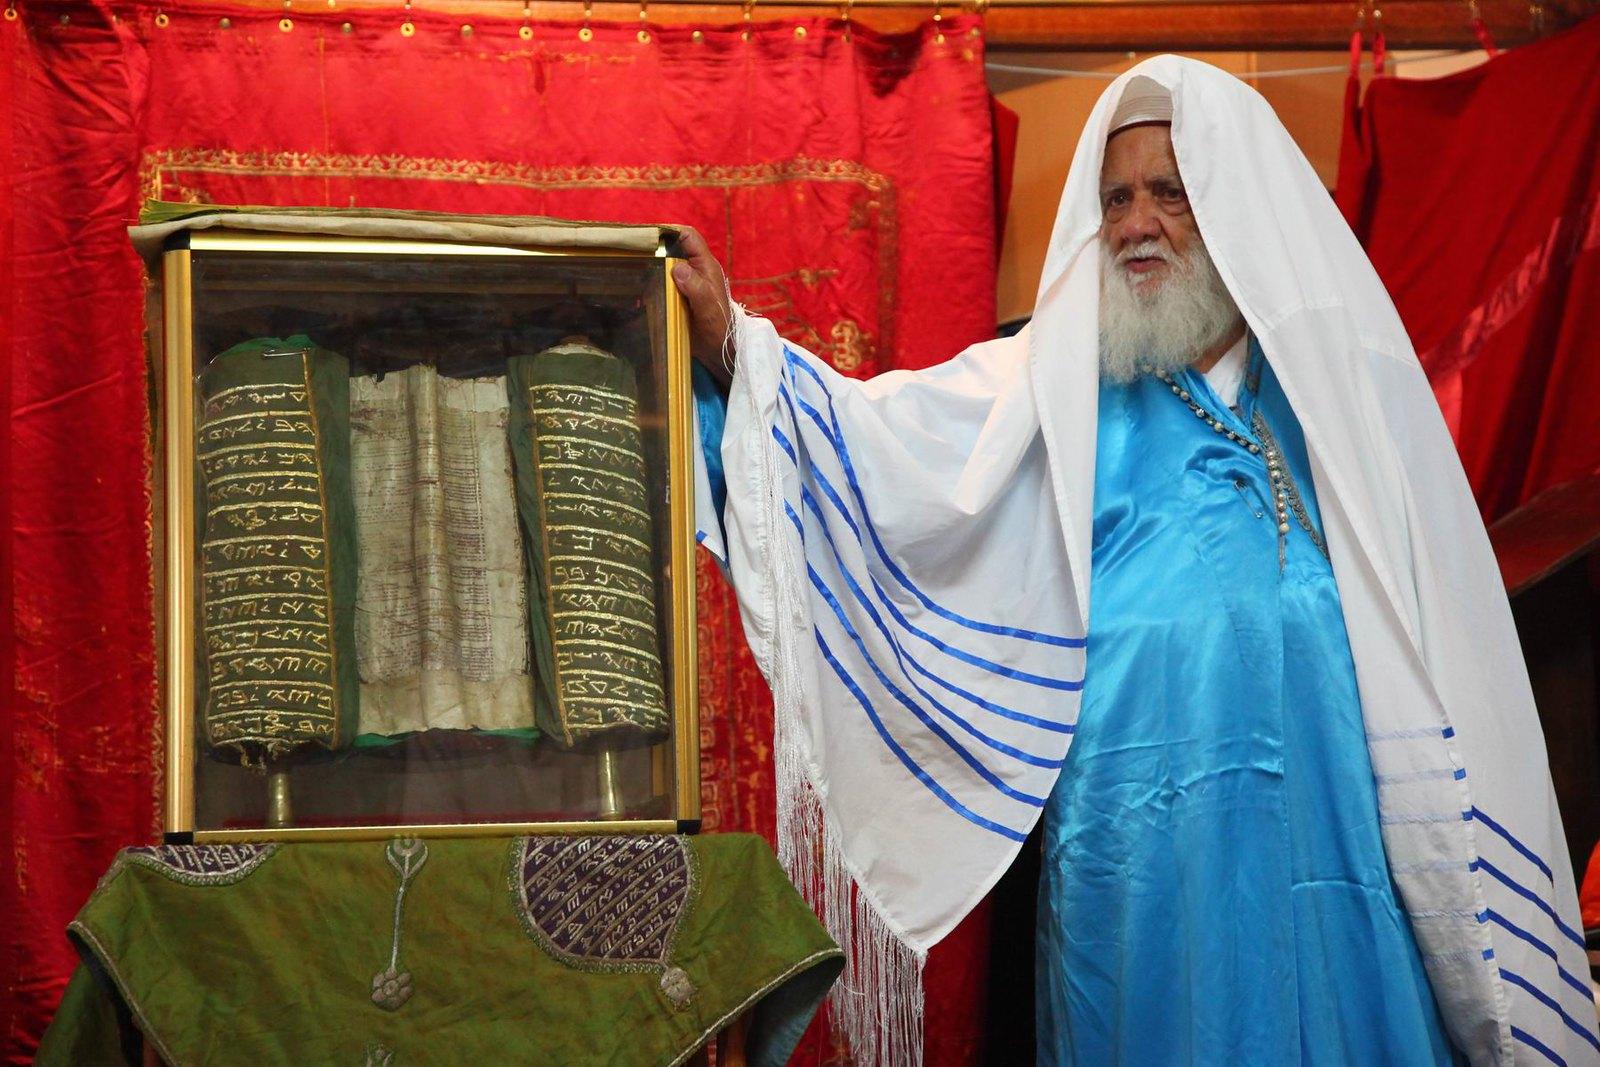 כהן שומרוני ליד הספר שכתב אבישוע.